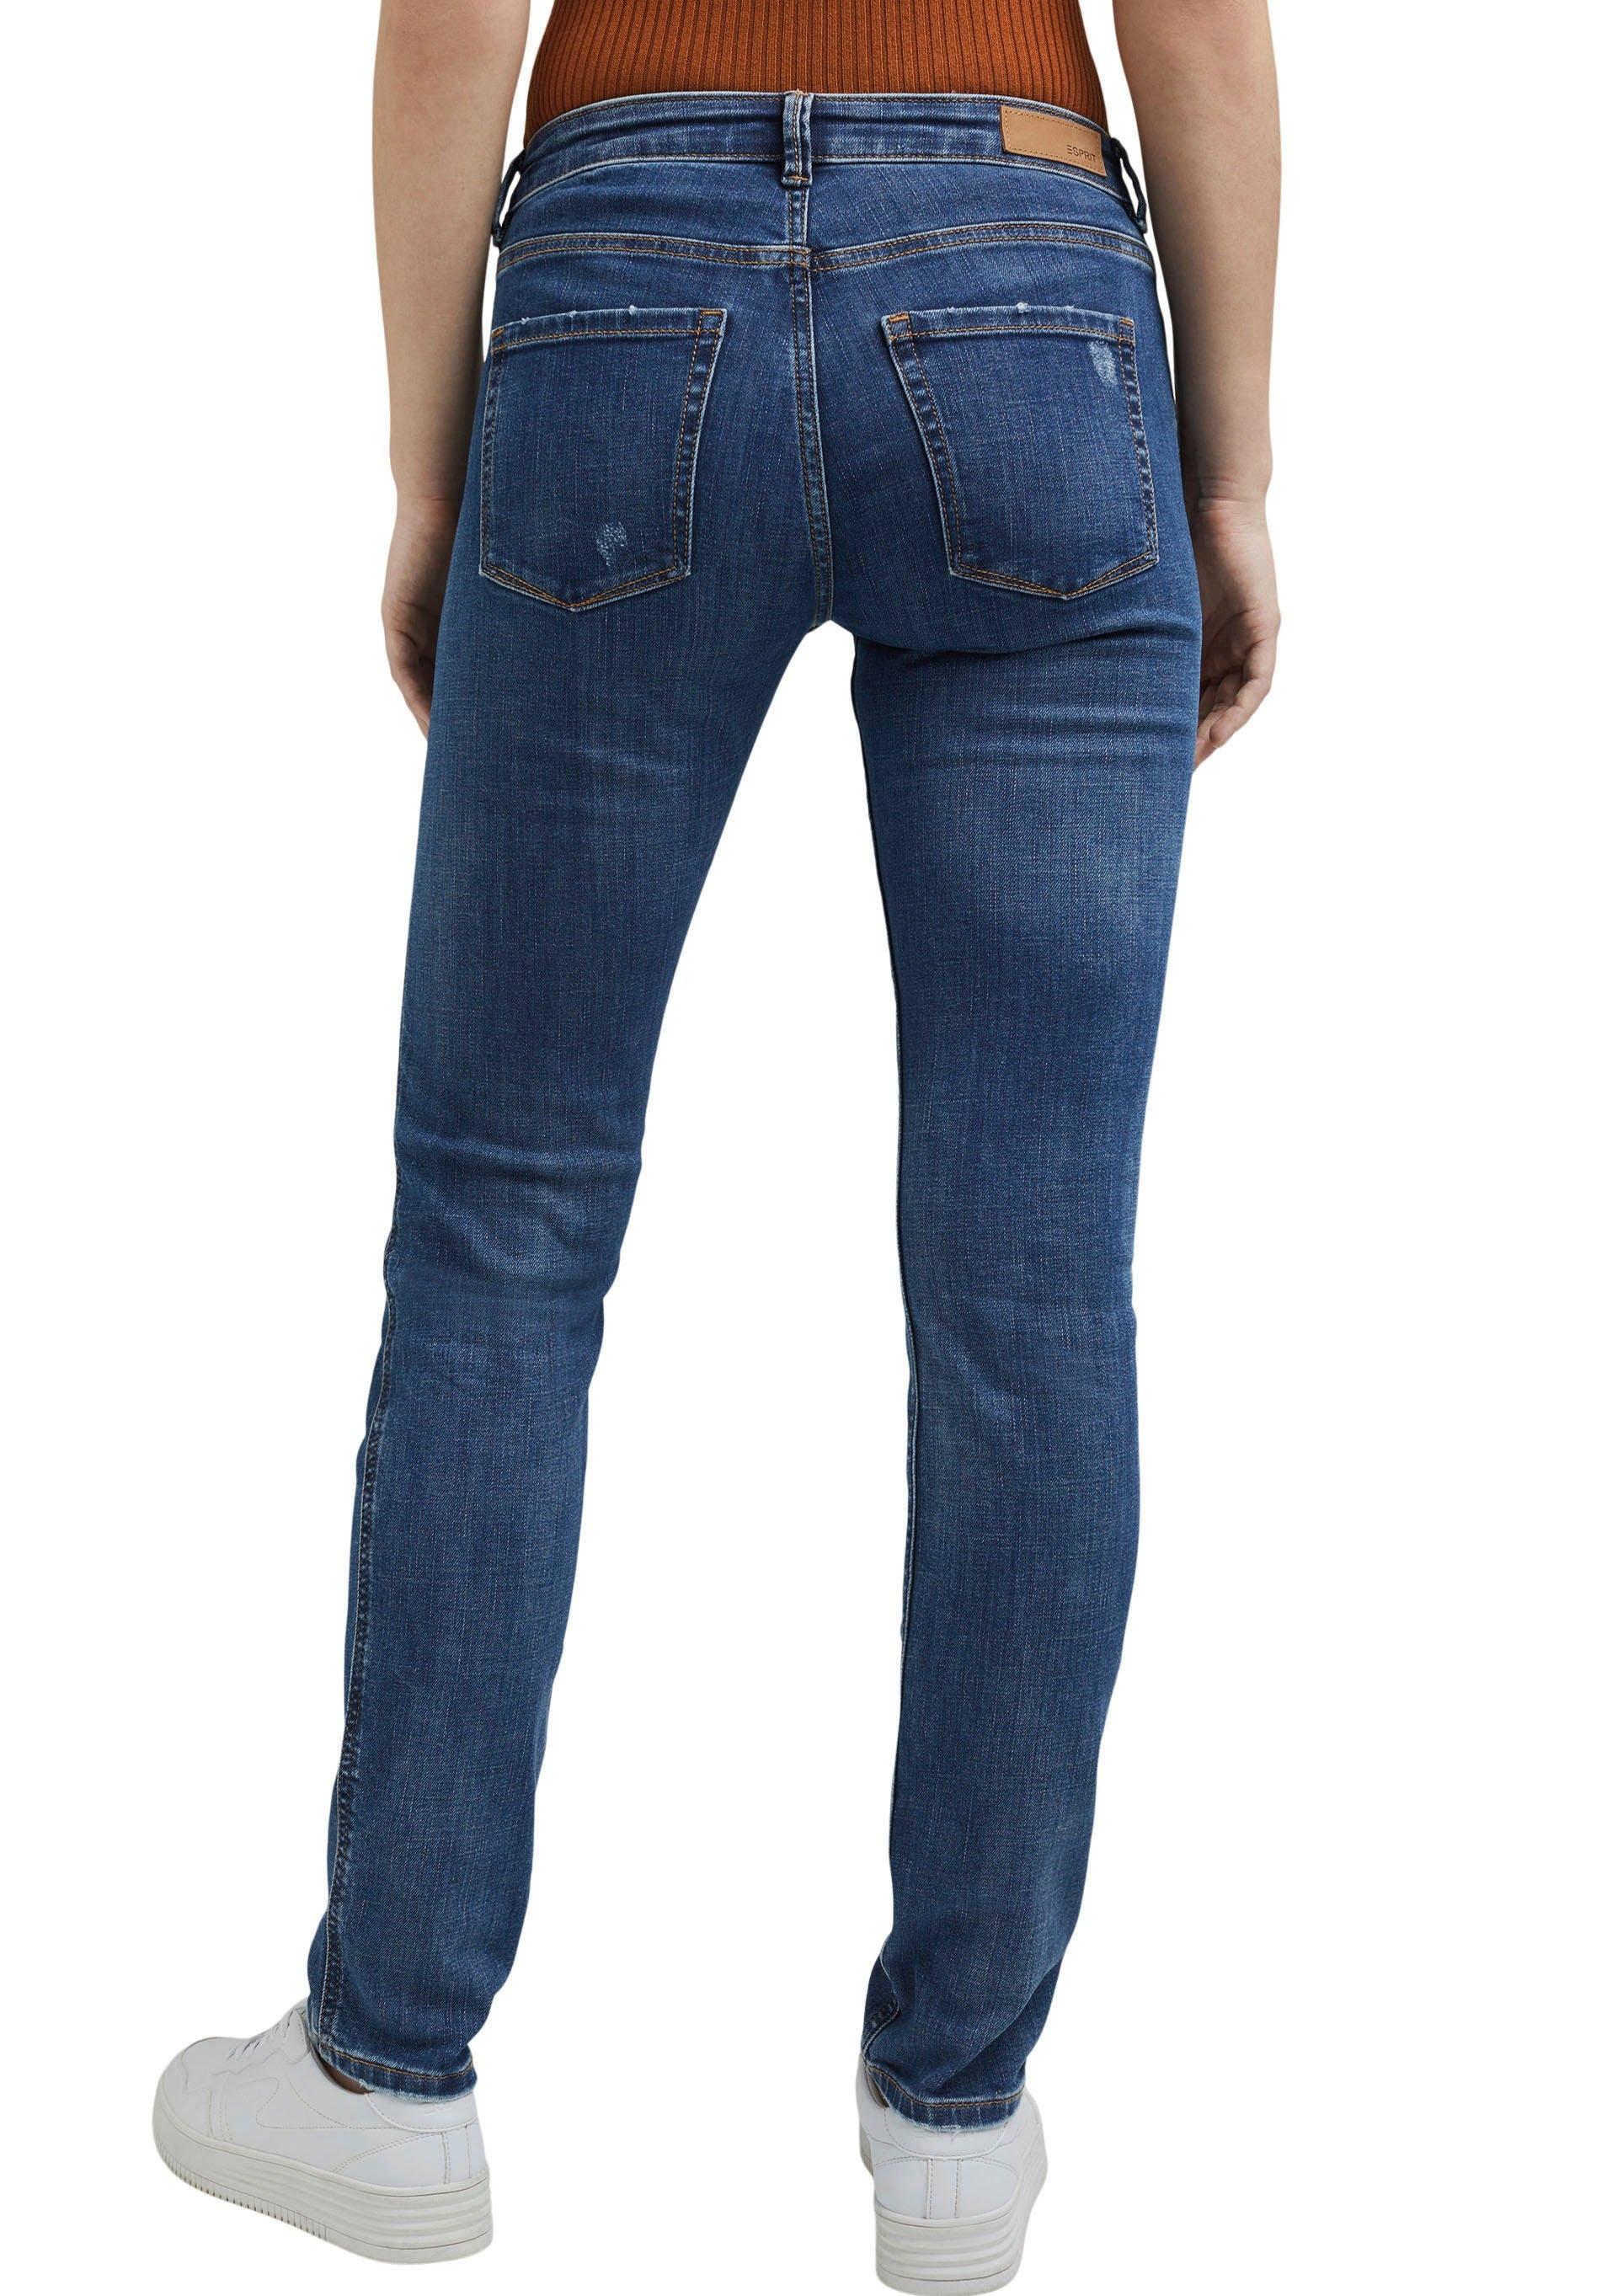 Esprit slim fit jeans - gratis ruilen op otto.nl